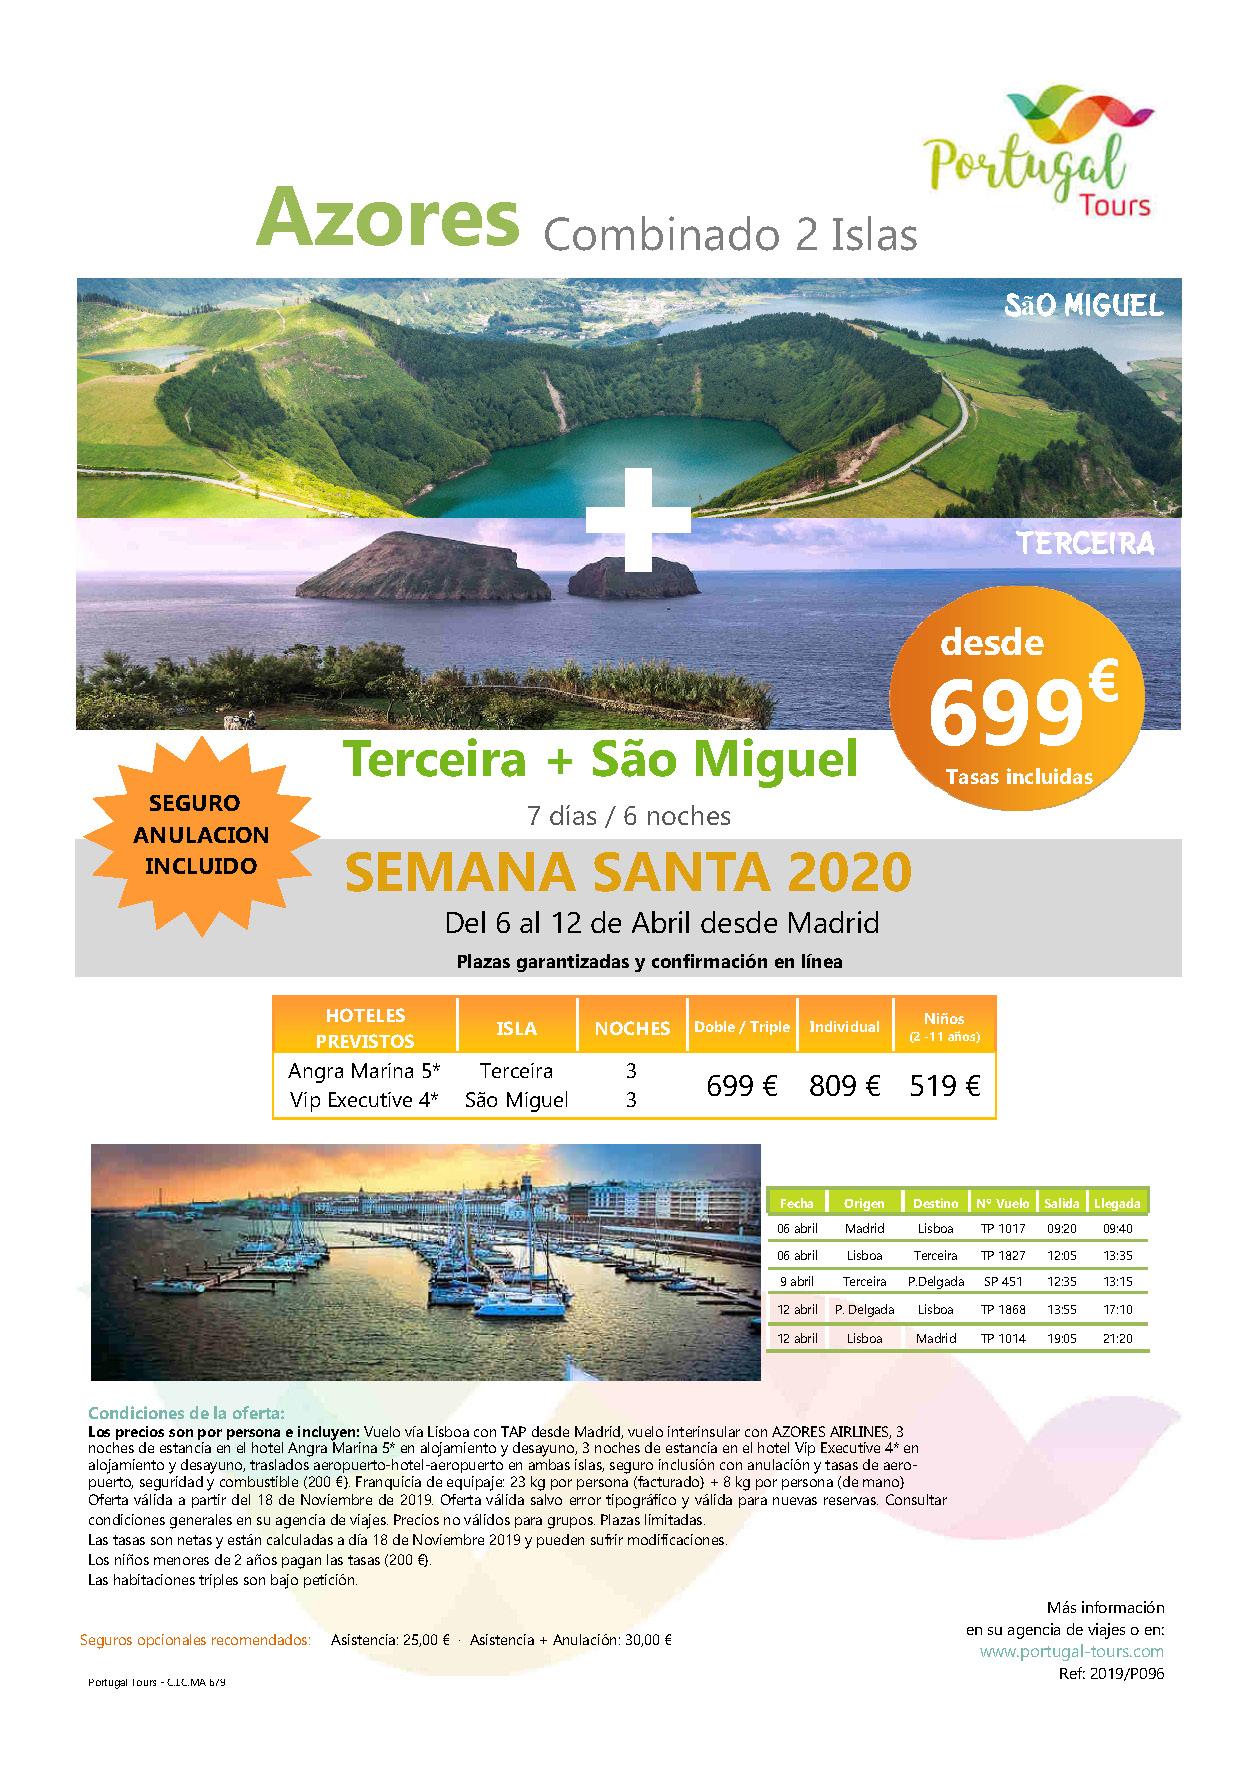 Oferta Portugal Tours Semana Santa en Azores Terceira y Sao Miguel 7 dias salidas Madrid